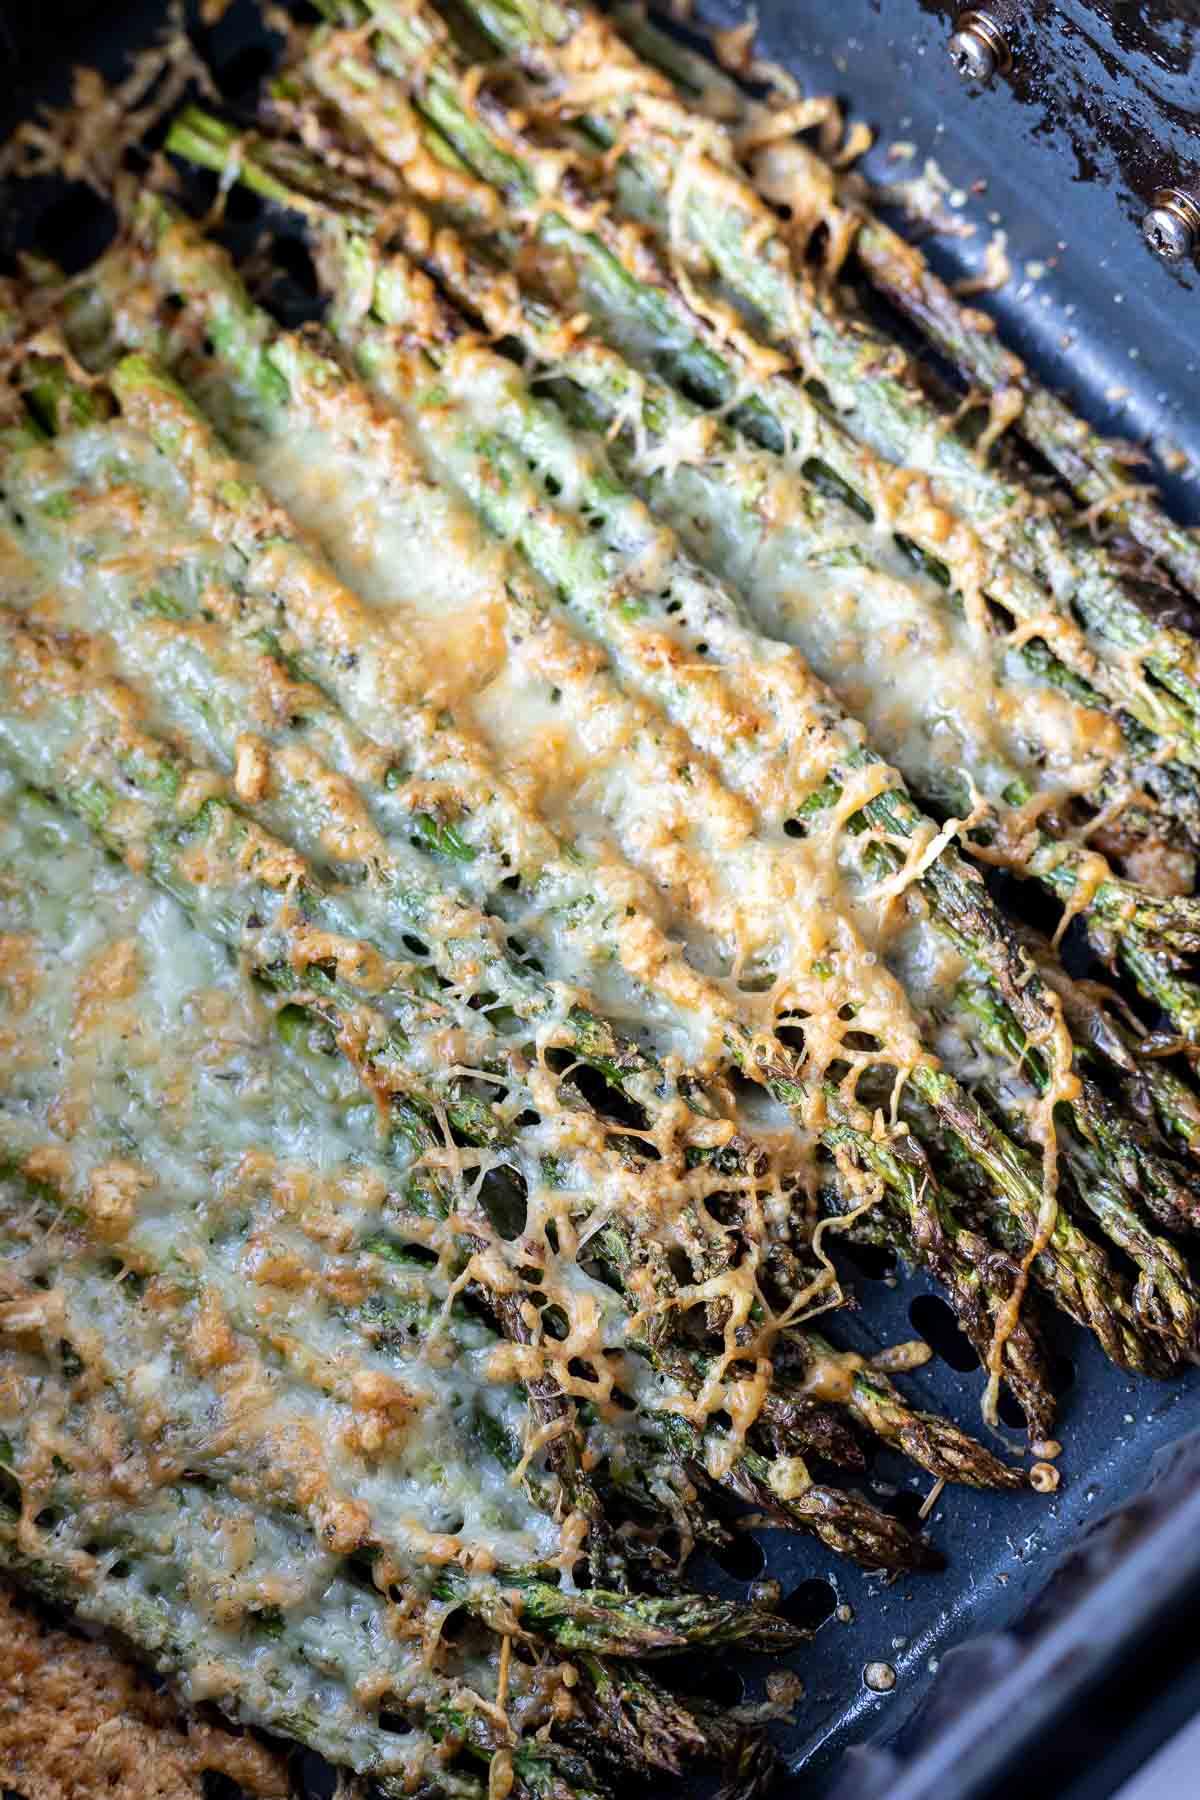 parmesan topped asparagus in air fryer basket